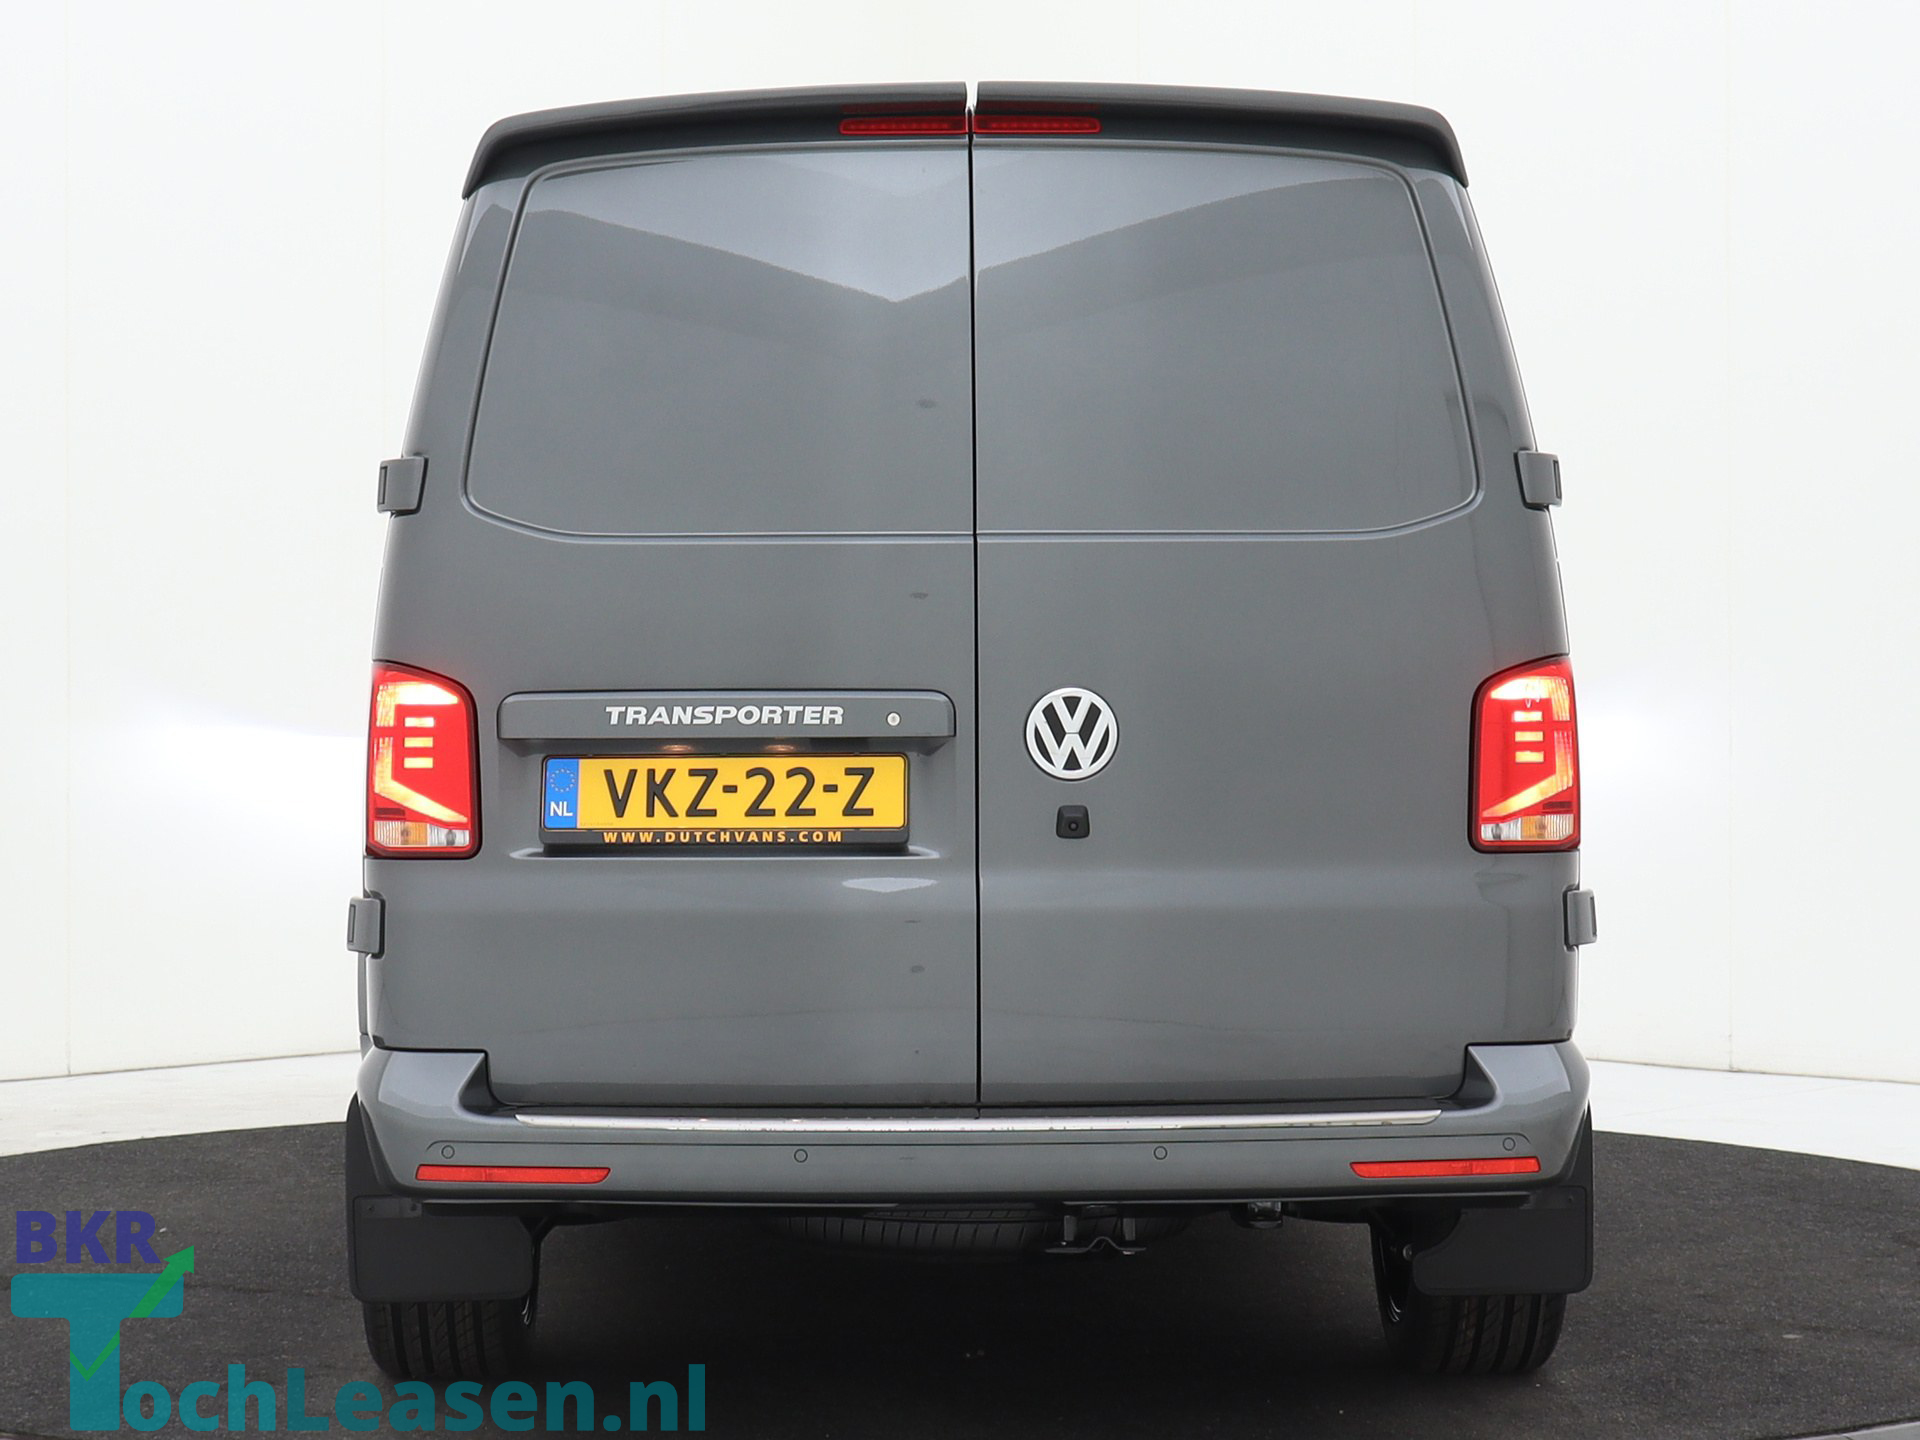 BKR toch leasen - Volkswagen Transporter - Grijs 3